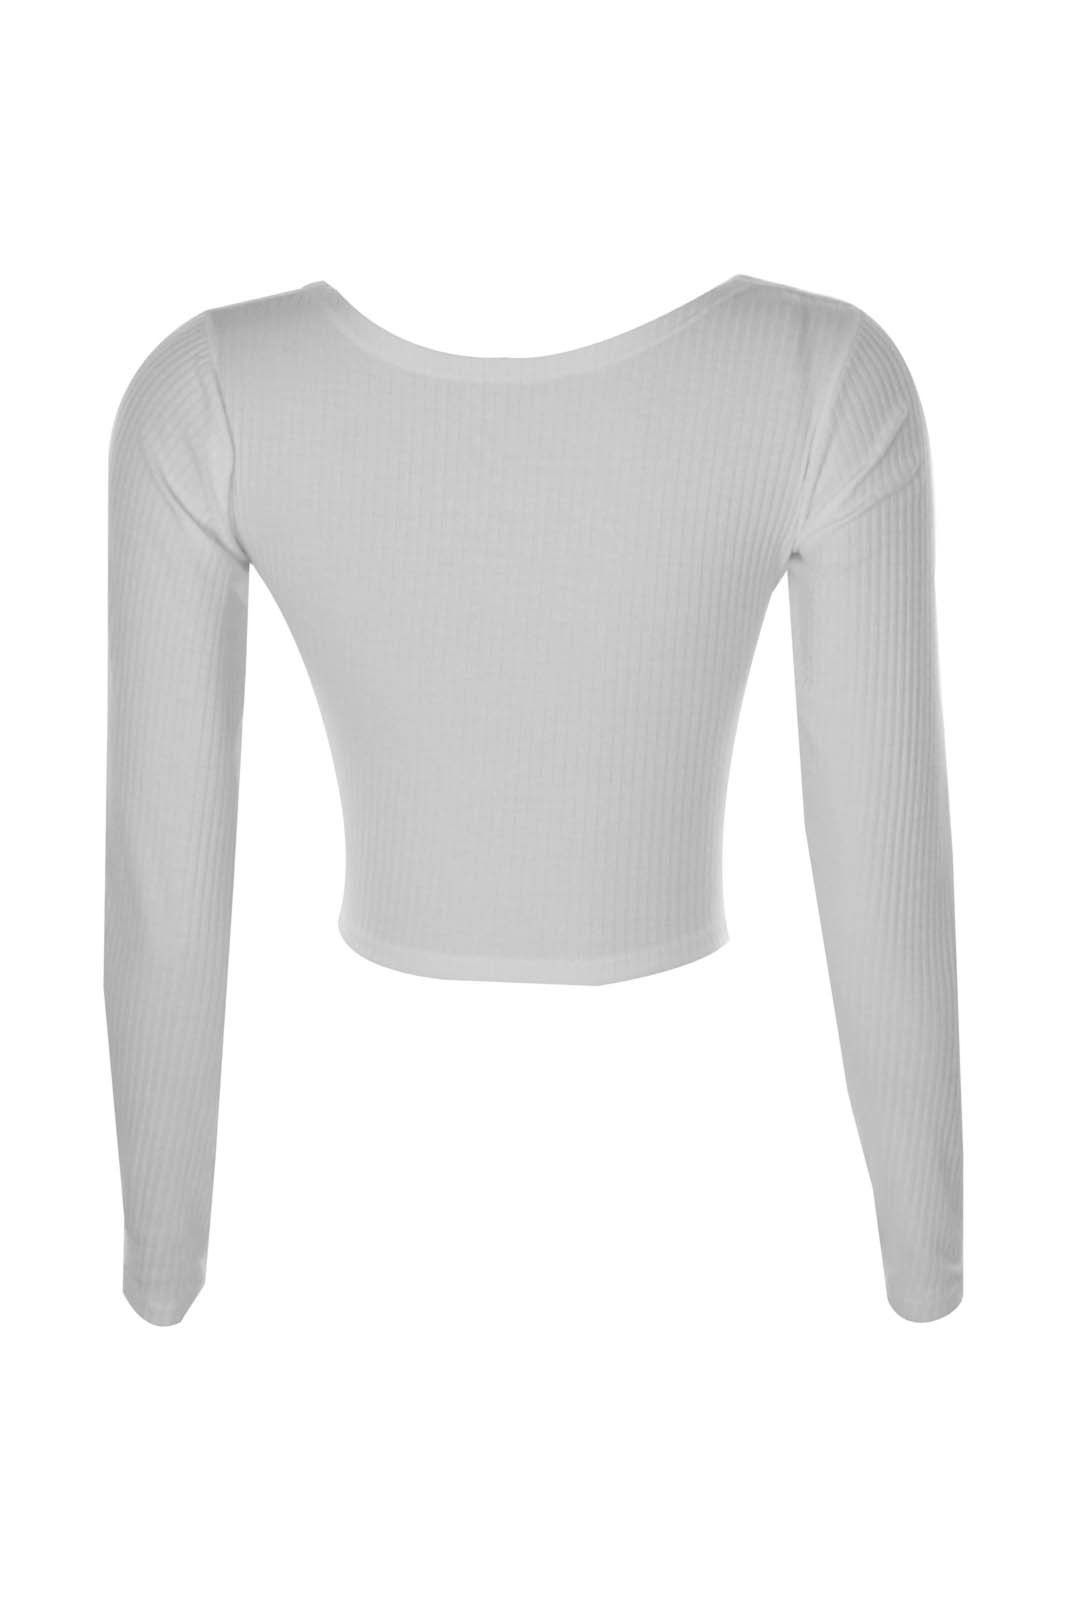 Blusa Cropped Outletdri Canelado Ml Branco